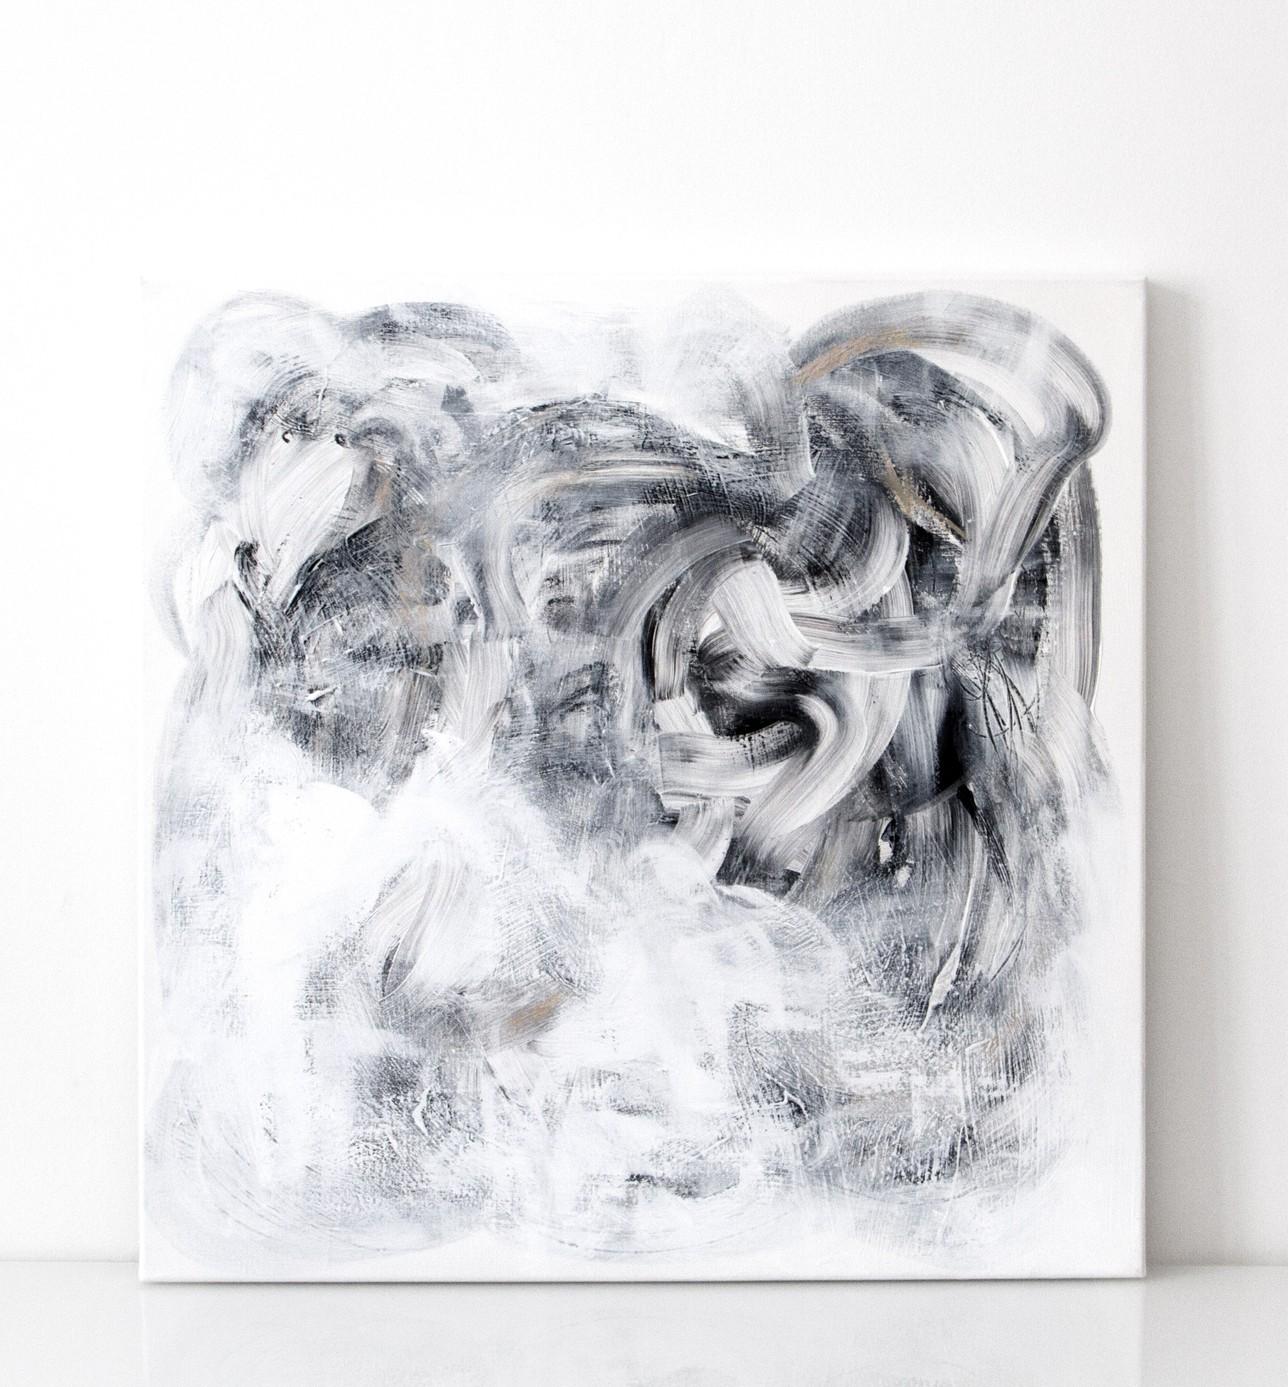 AALTO | 016  2015 acrylic on canvas 90 x 90 cm | SOLD